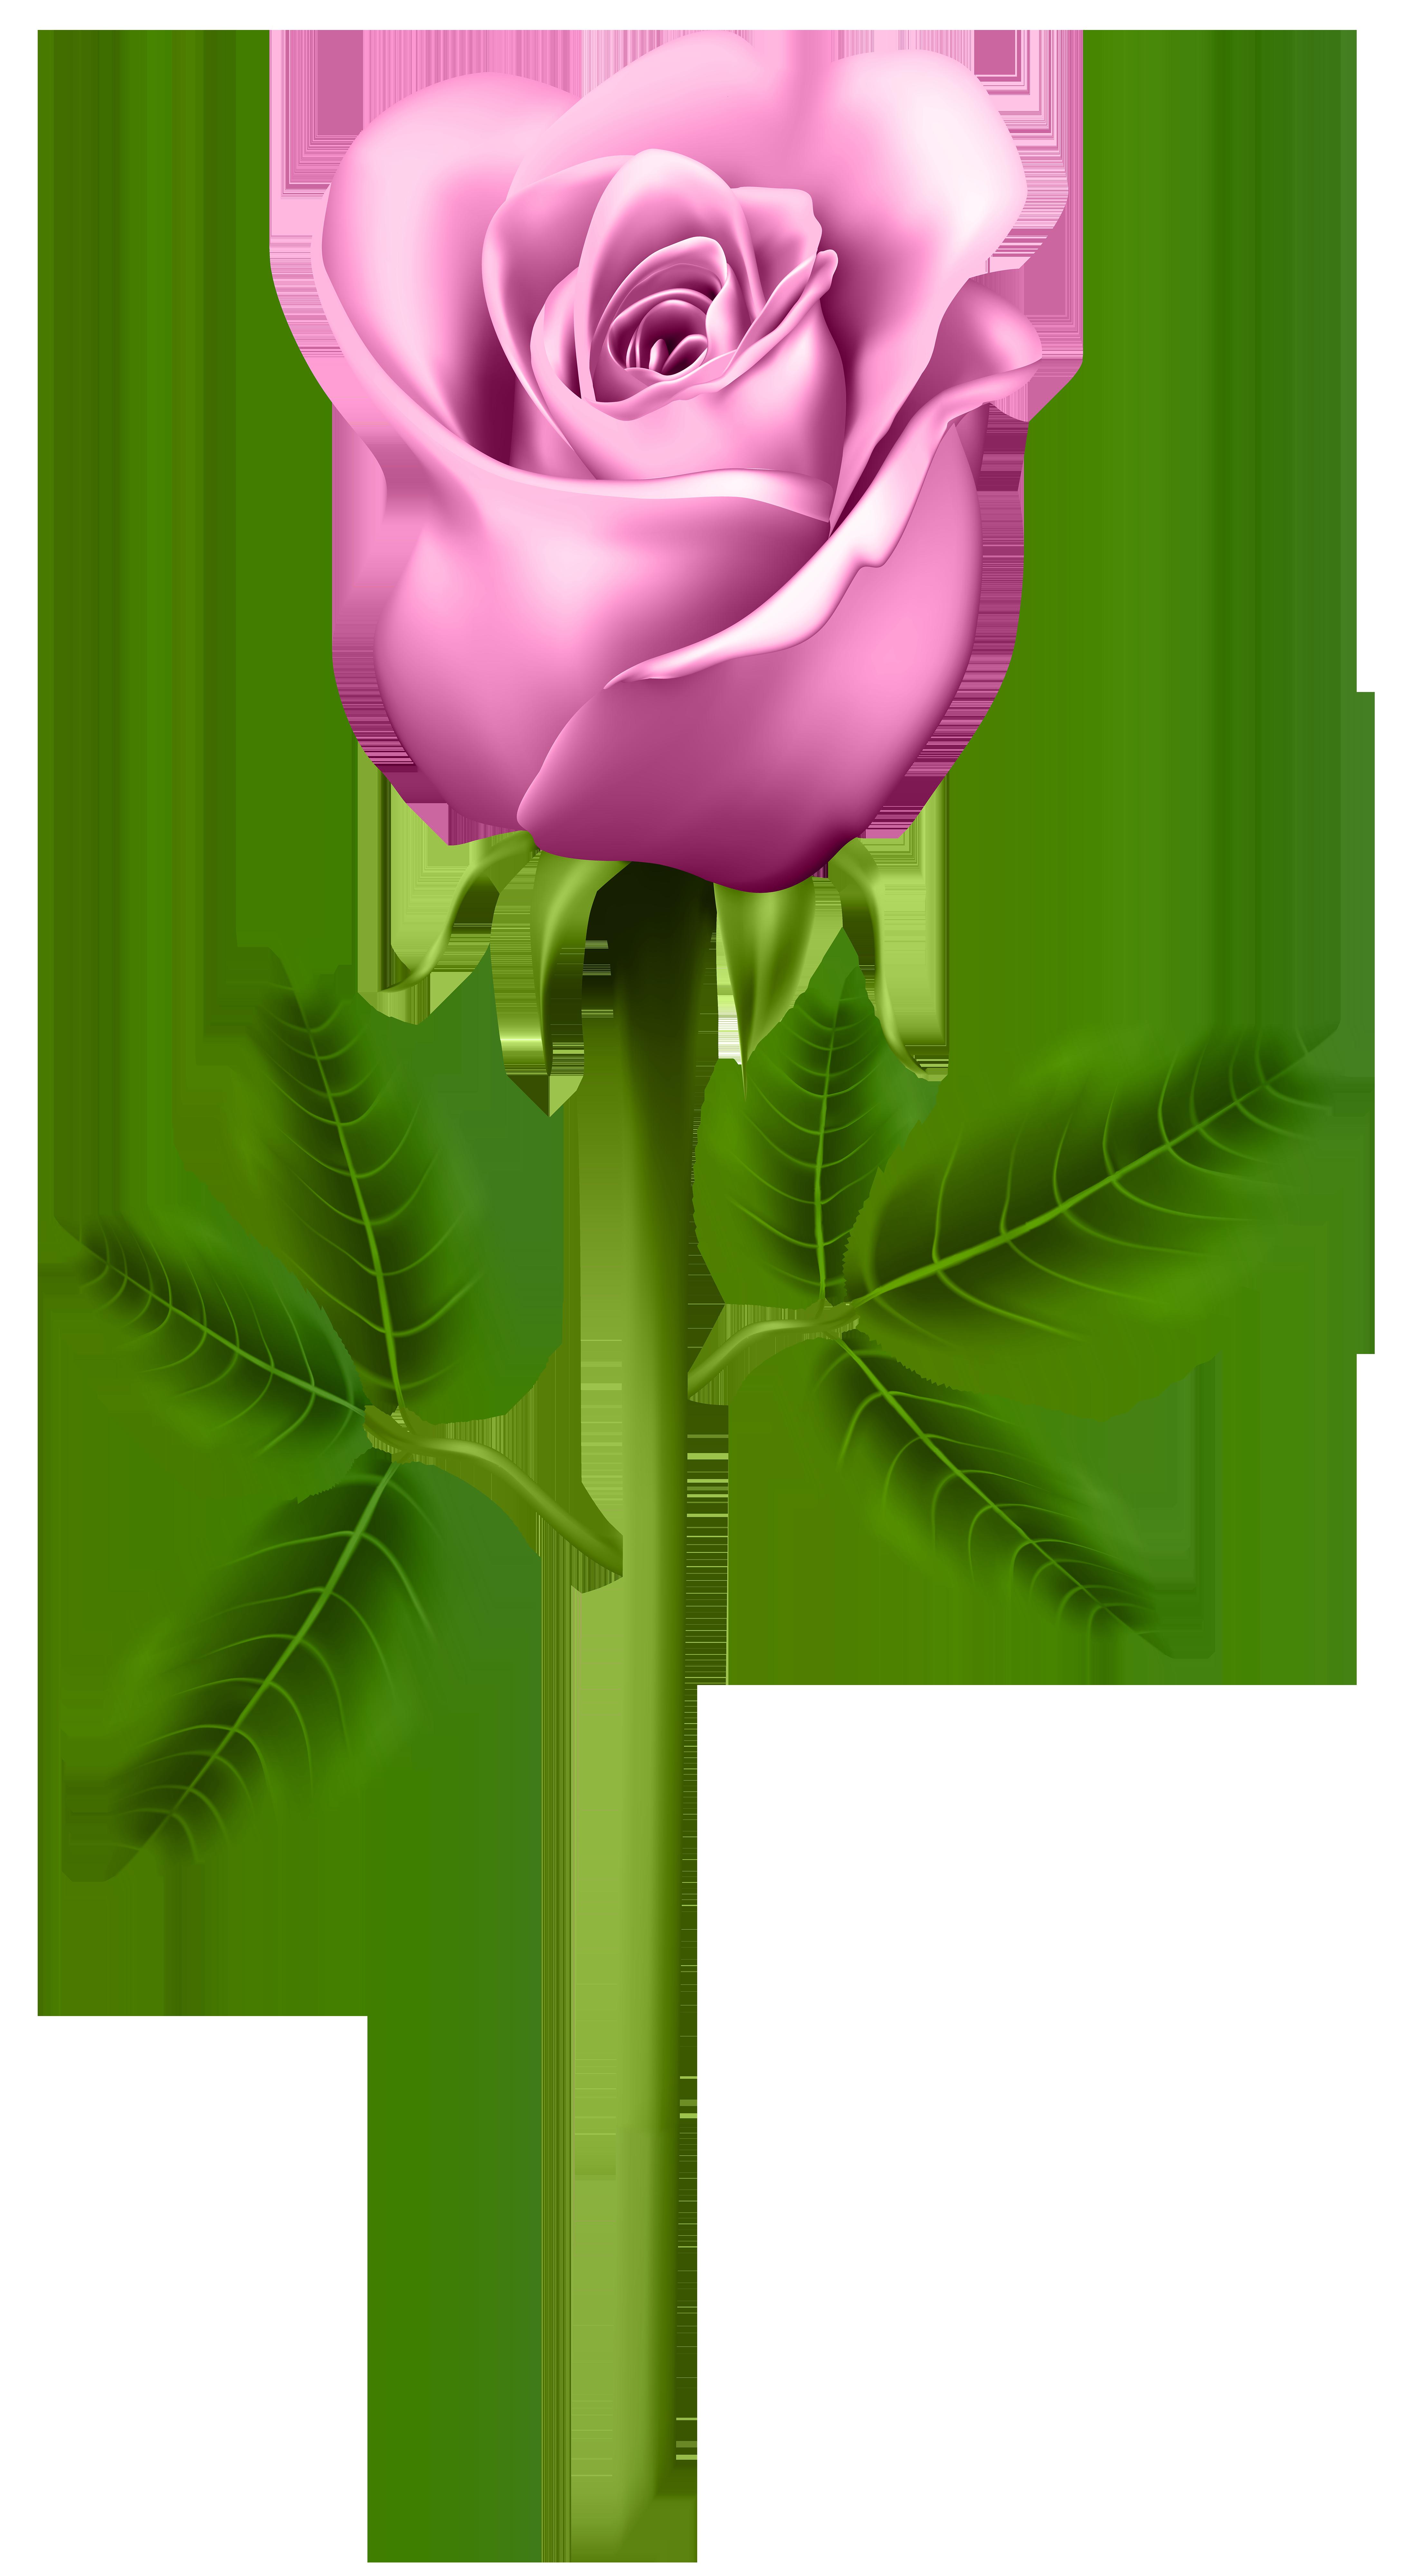 Pink transparent png image. Rose clipart stick